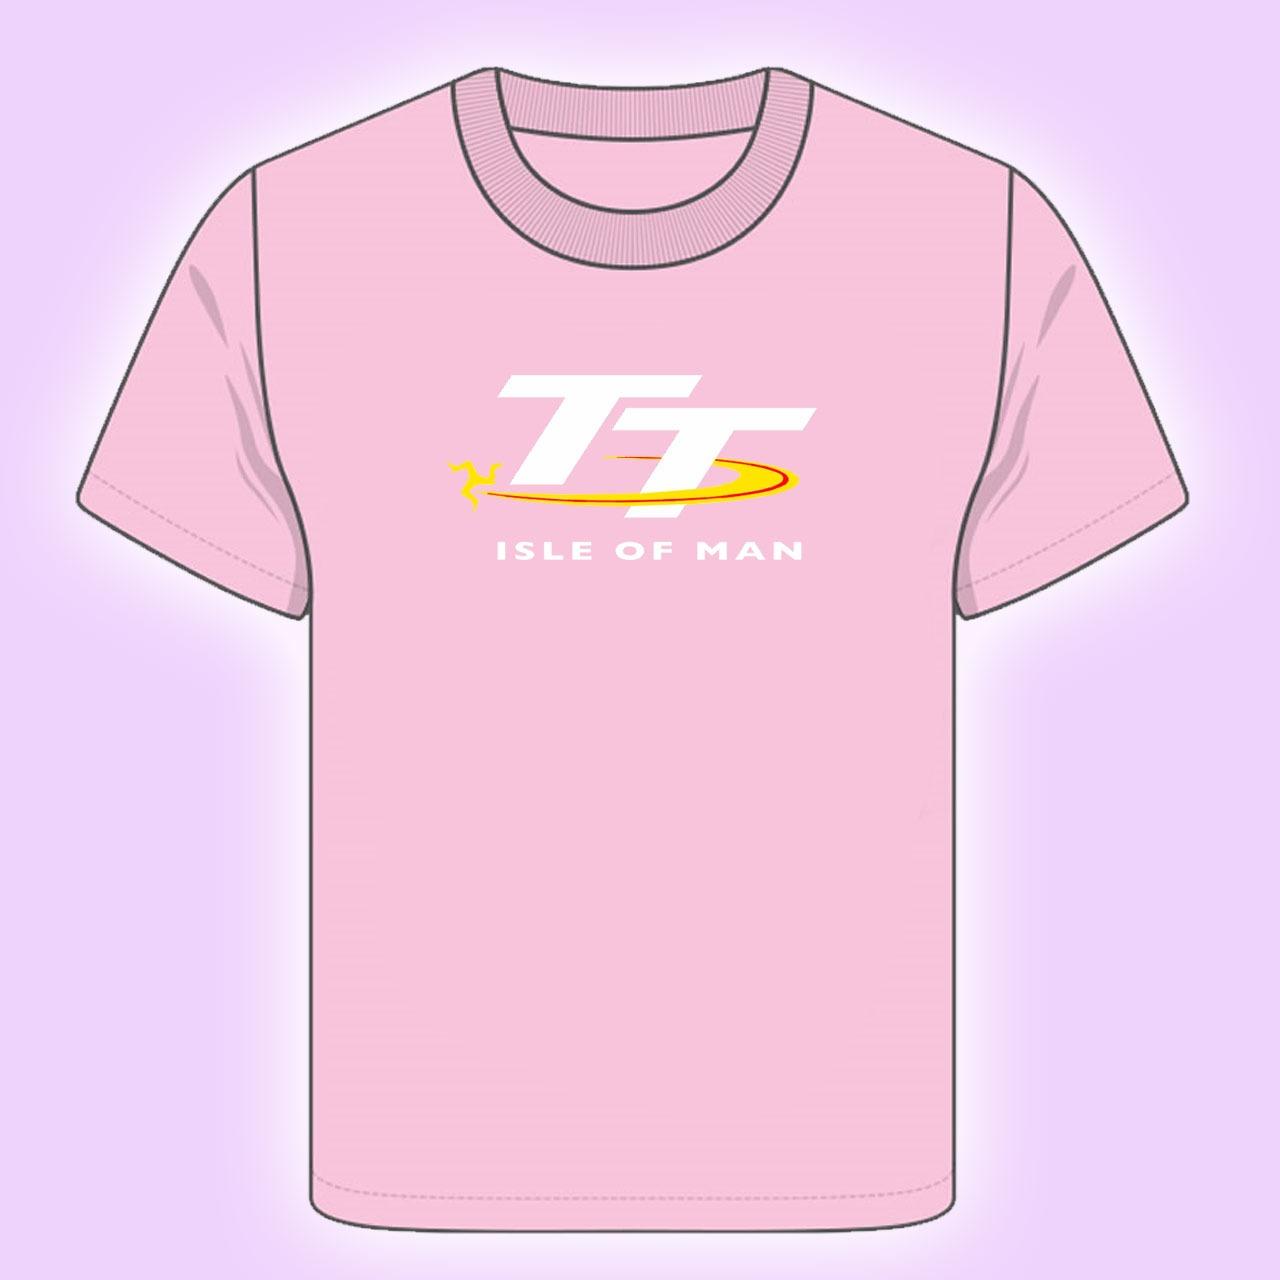 3b83105d8 KIDS TT LOGO PINK T-SHIRT 18ZKTS4 | T-SHIRTS - KIDS | TT Shirts | Manx  Shirts